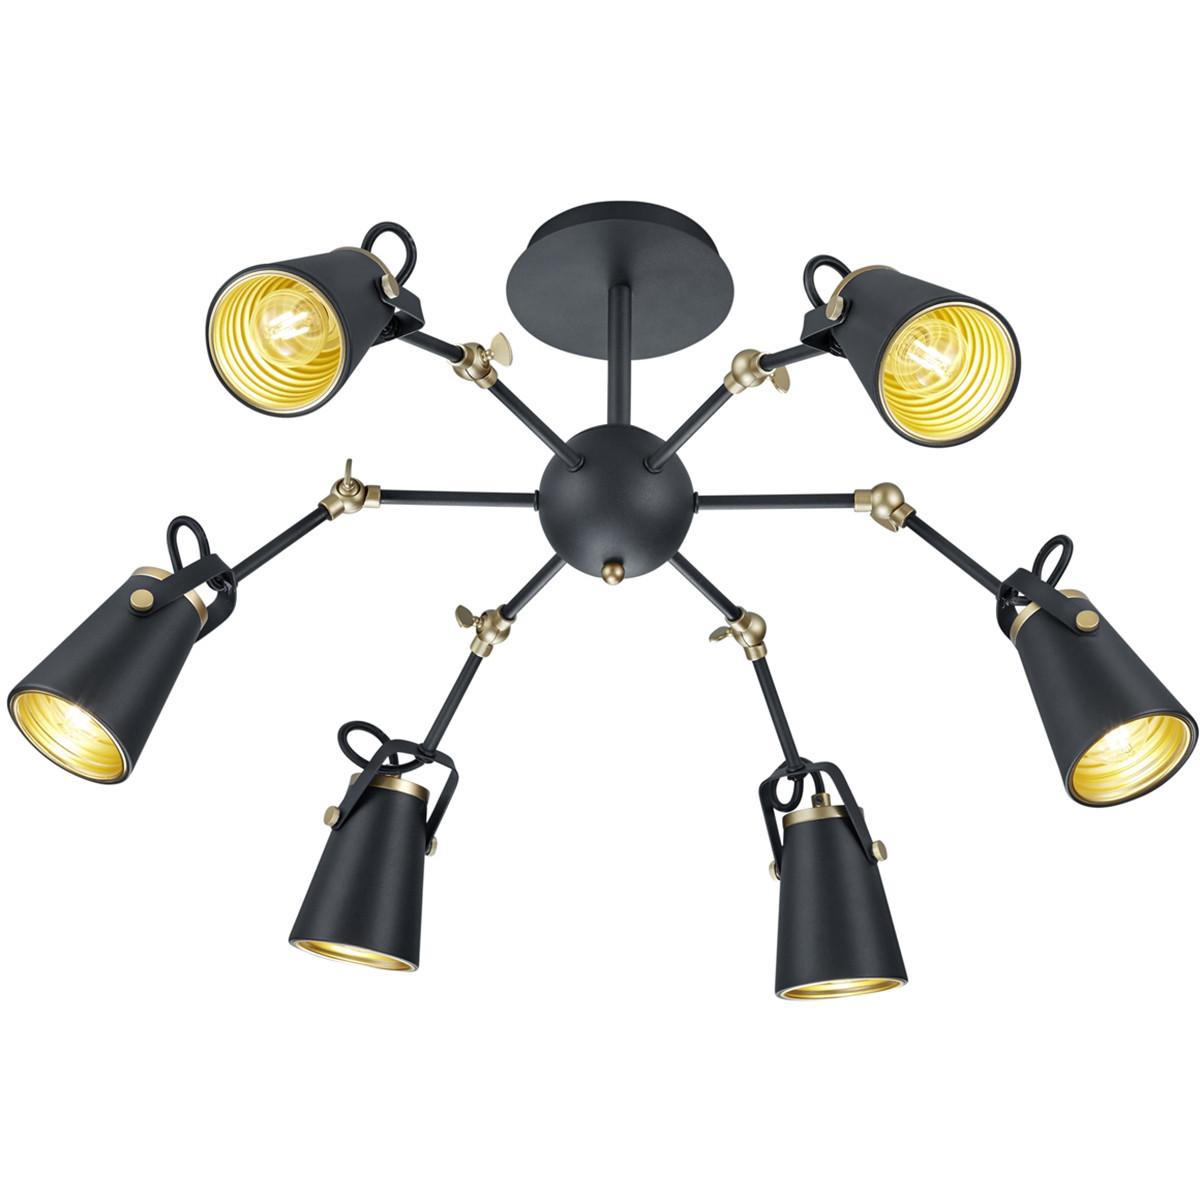 LED Plafondlamp - Plafondverlichting - Trion Edwy - E14 Fitting - 6-lichts - Rond - Mat Zwart - Alum